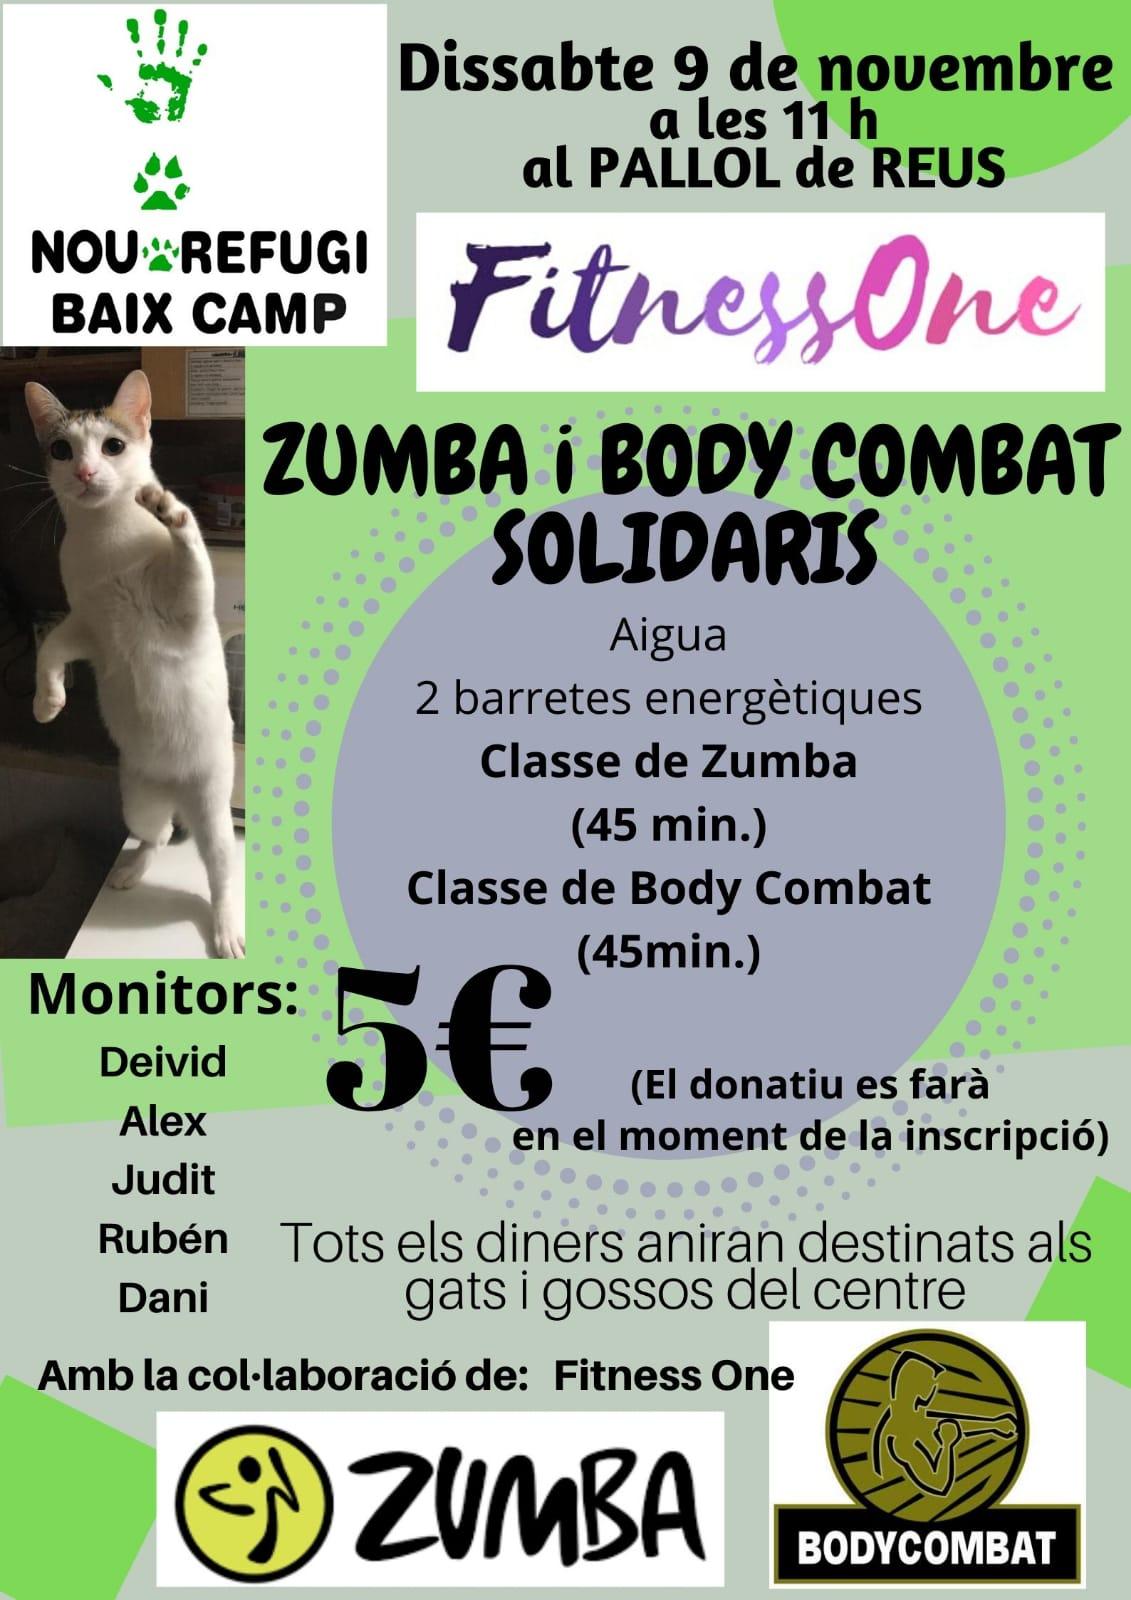 Zumba Y Body Combat Solidarios – FITNESSONE